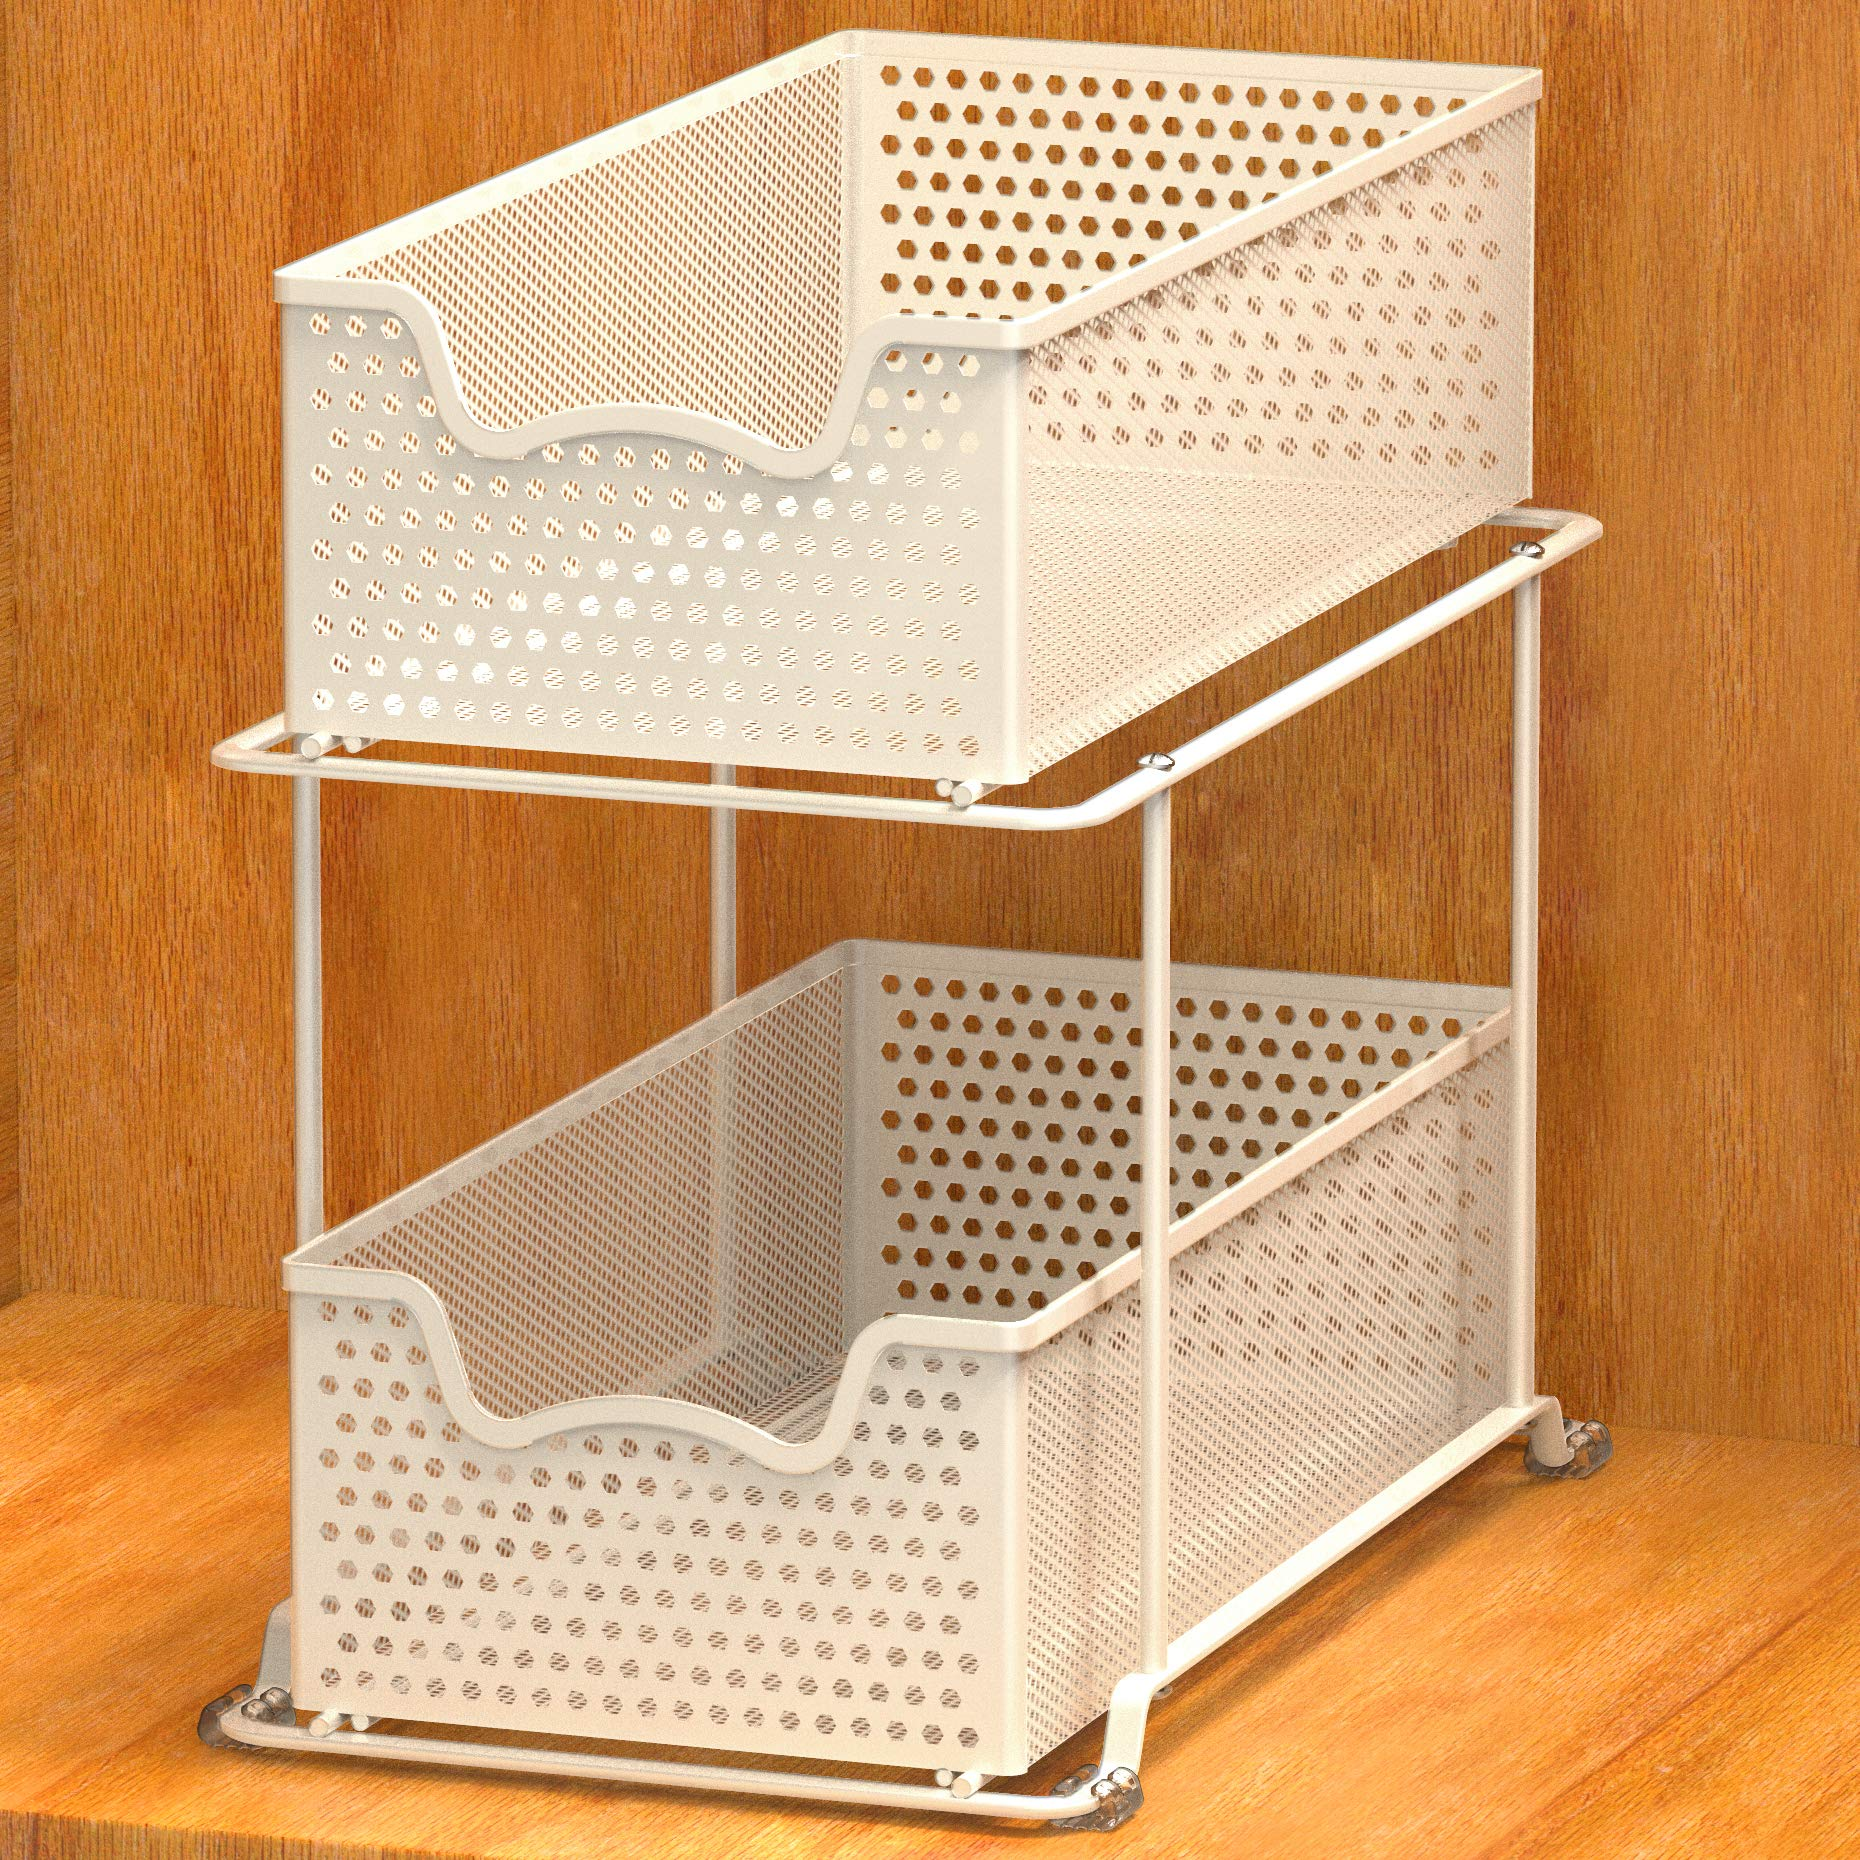 Bronze Simple Houseware Stackable 3 Tier Sliding Basket Organizer Drawer